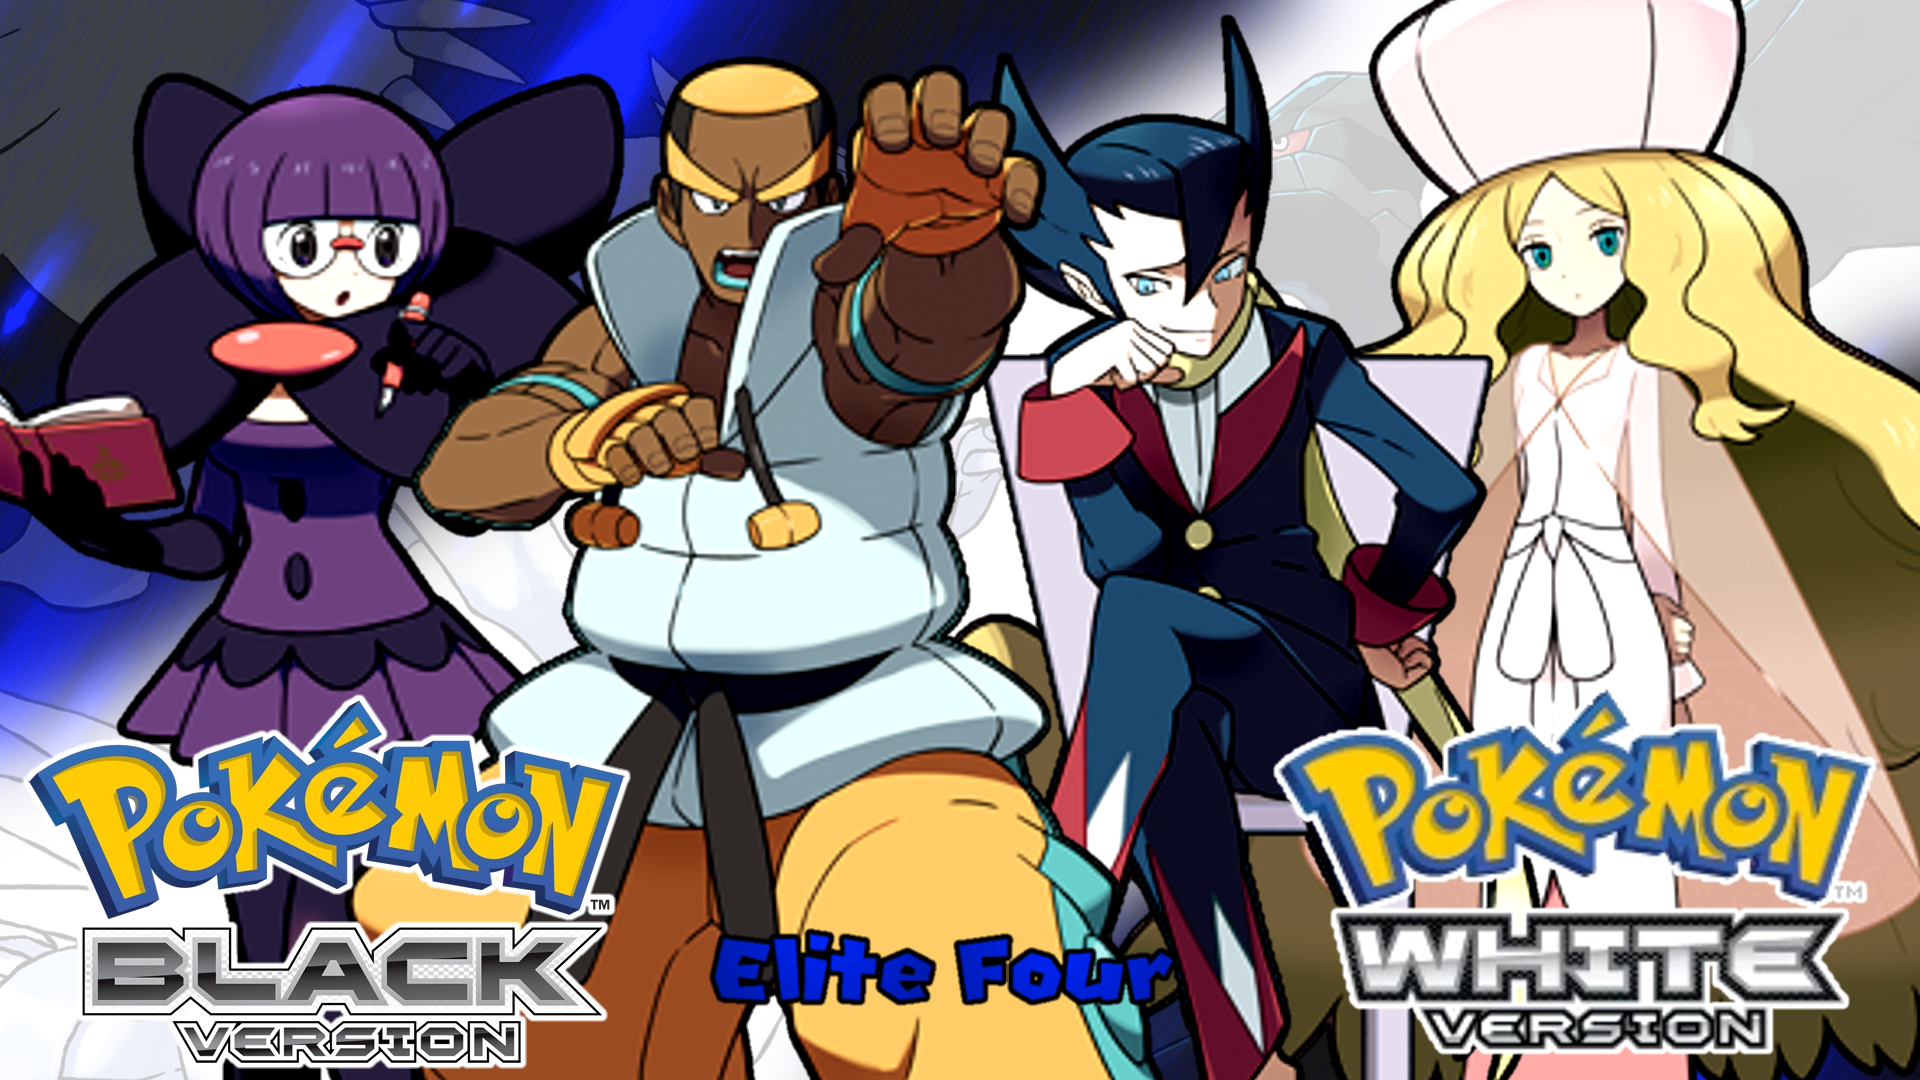 Pokemon Black And White The Elite Four Wallpaper By Mattplaysvg On Deviantart